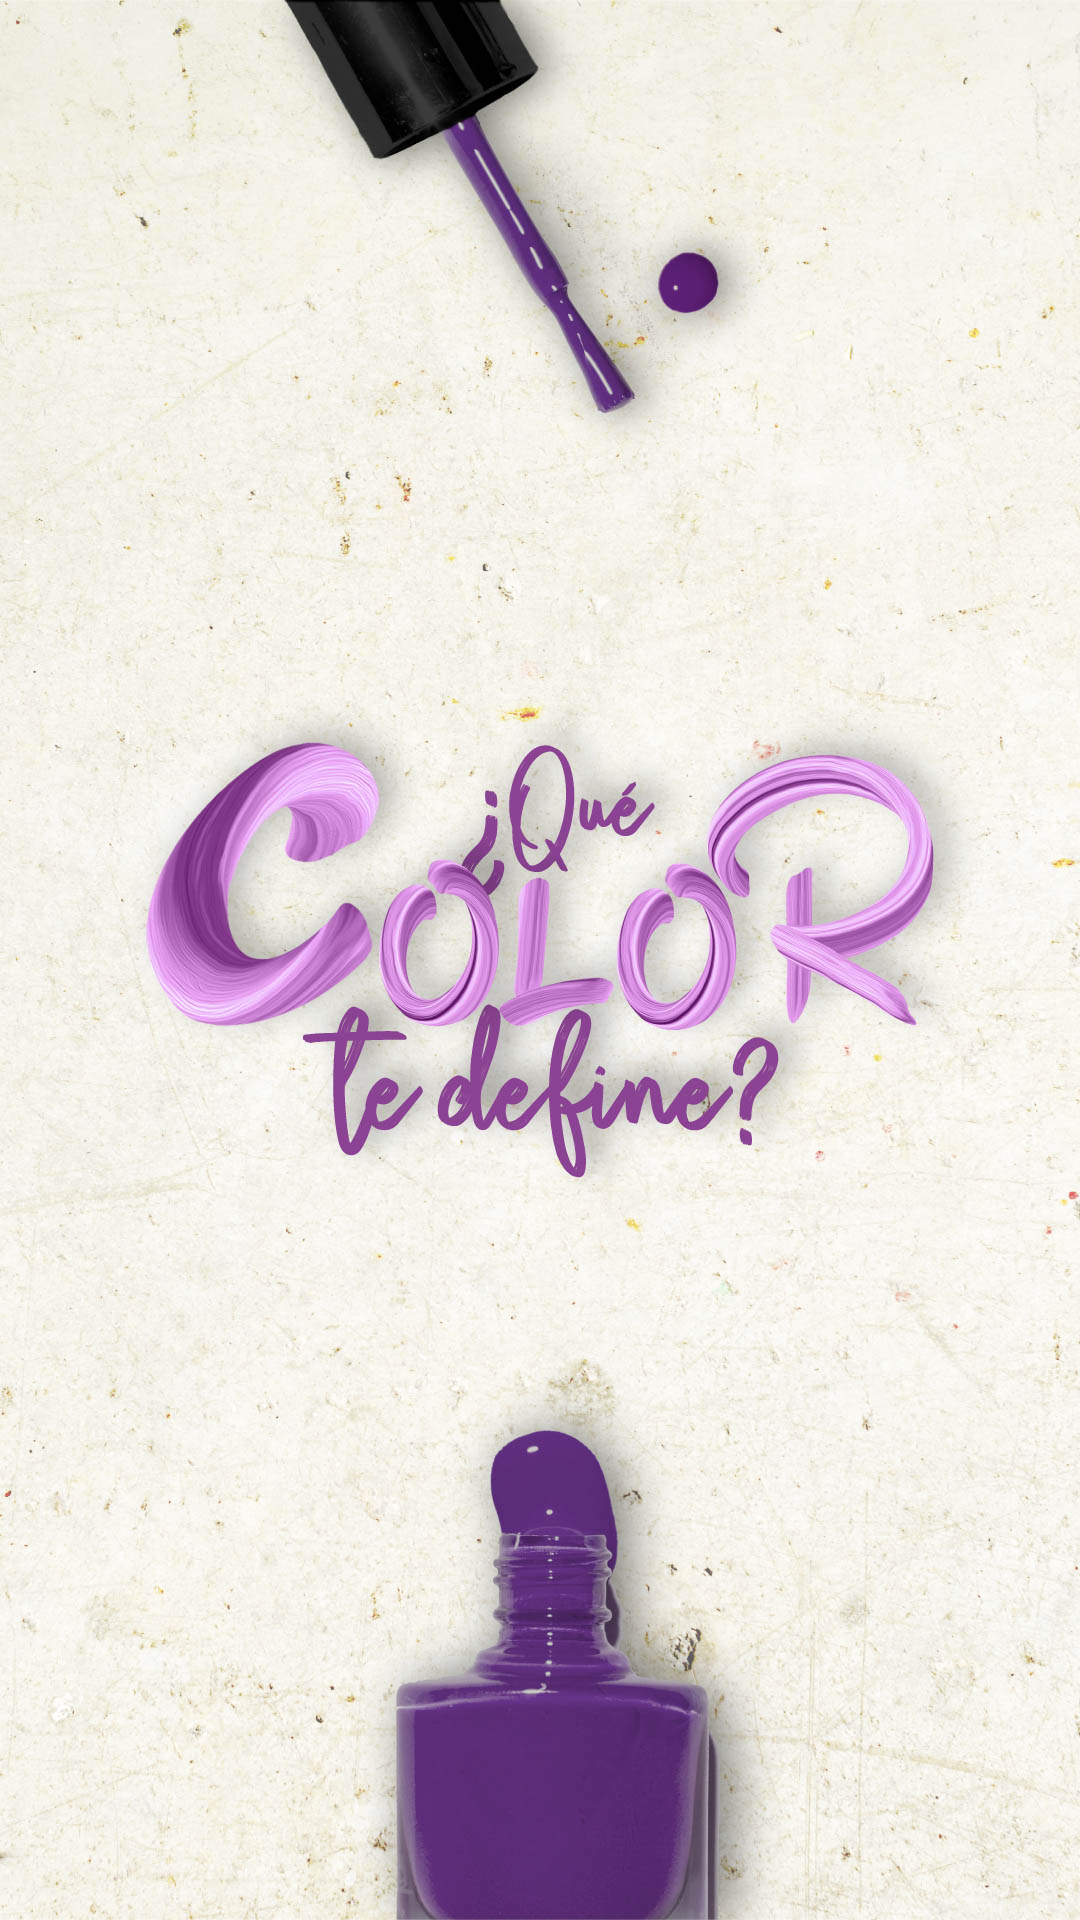 davos color campaña-5